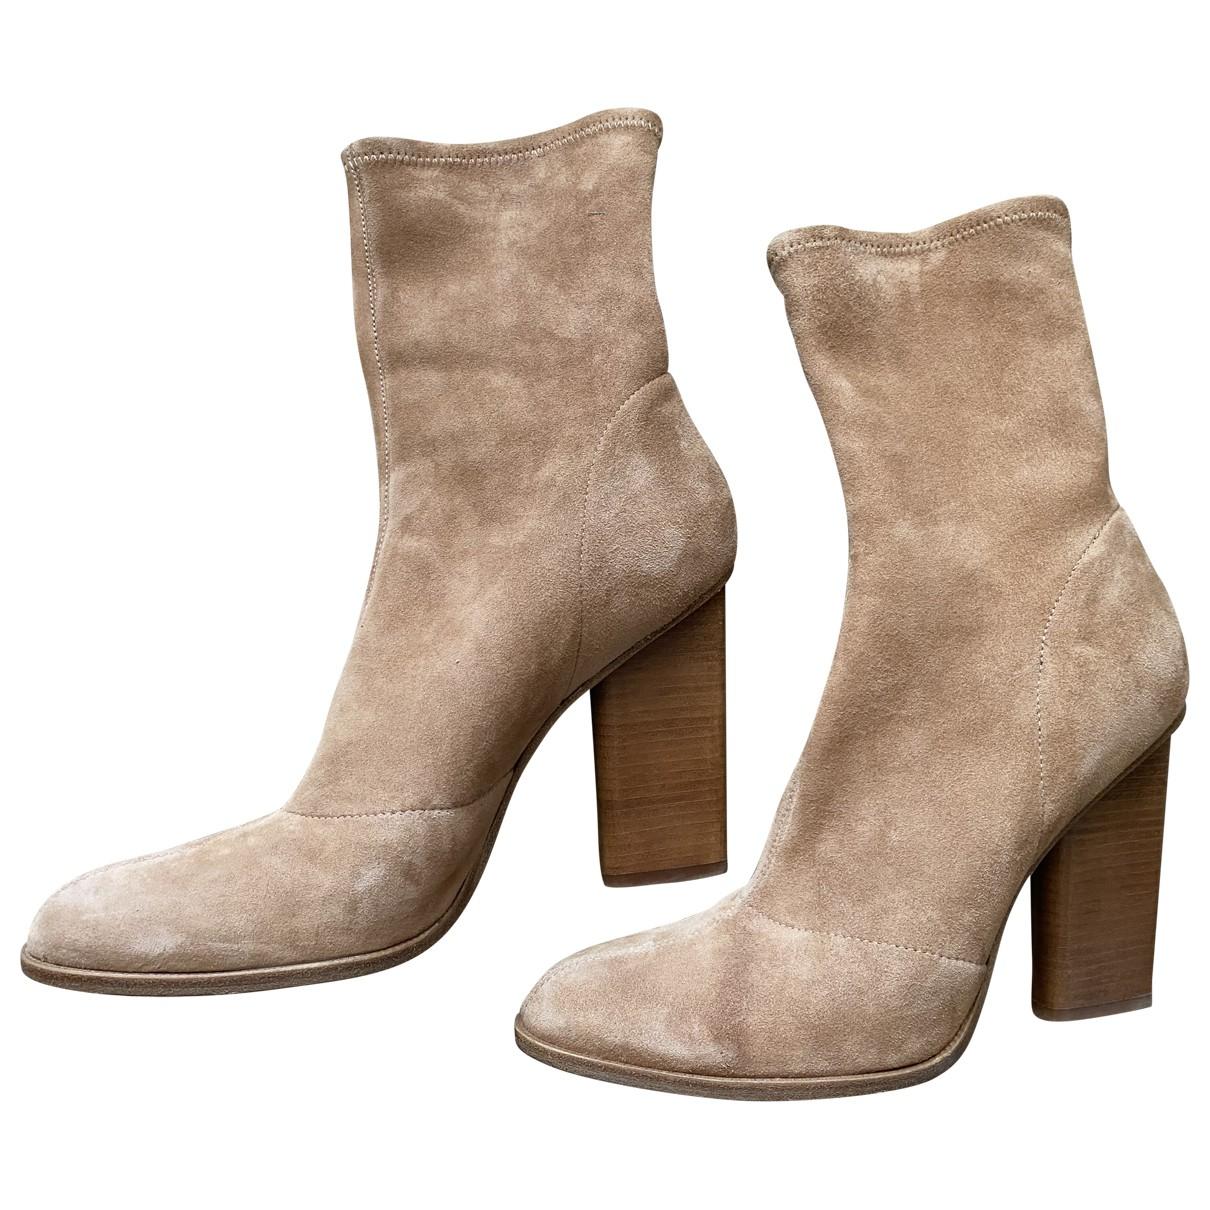 Alexander Wang \N Beige Suede Ankle boots for Women 38 EU